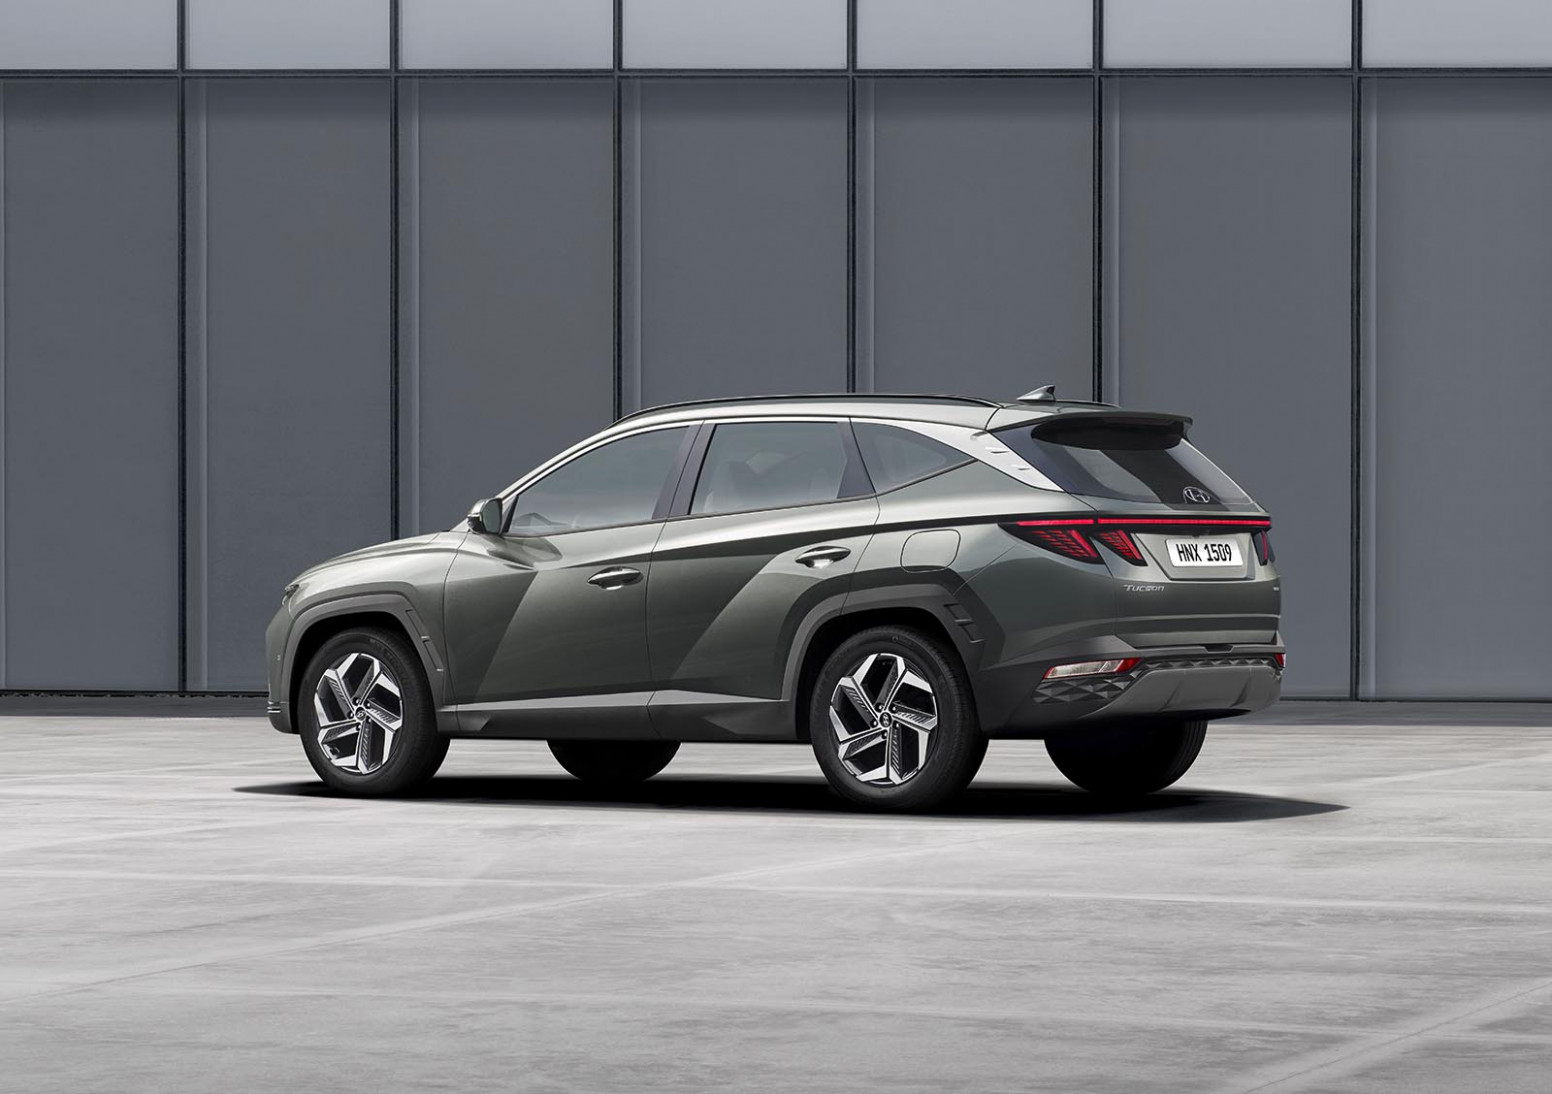 Redesign and Review Hyundai Ute 2022